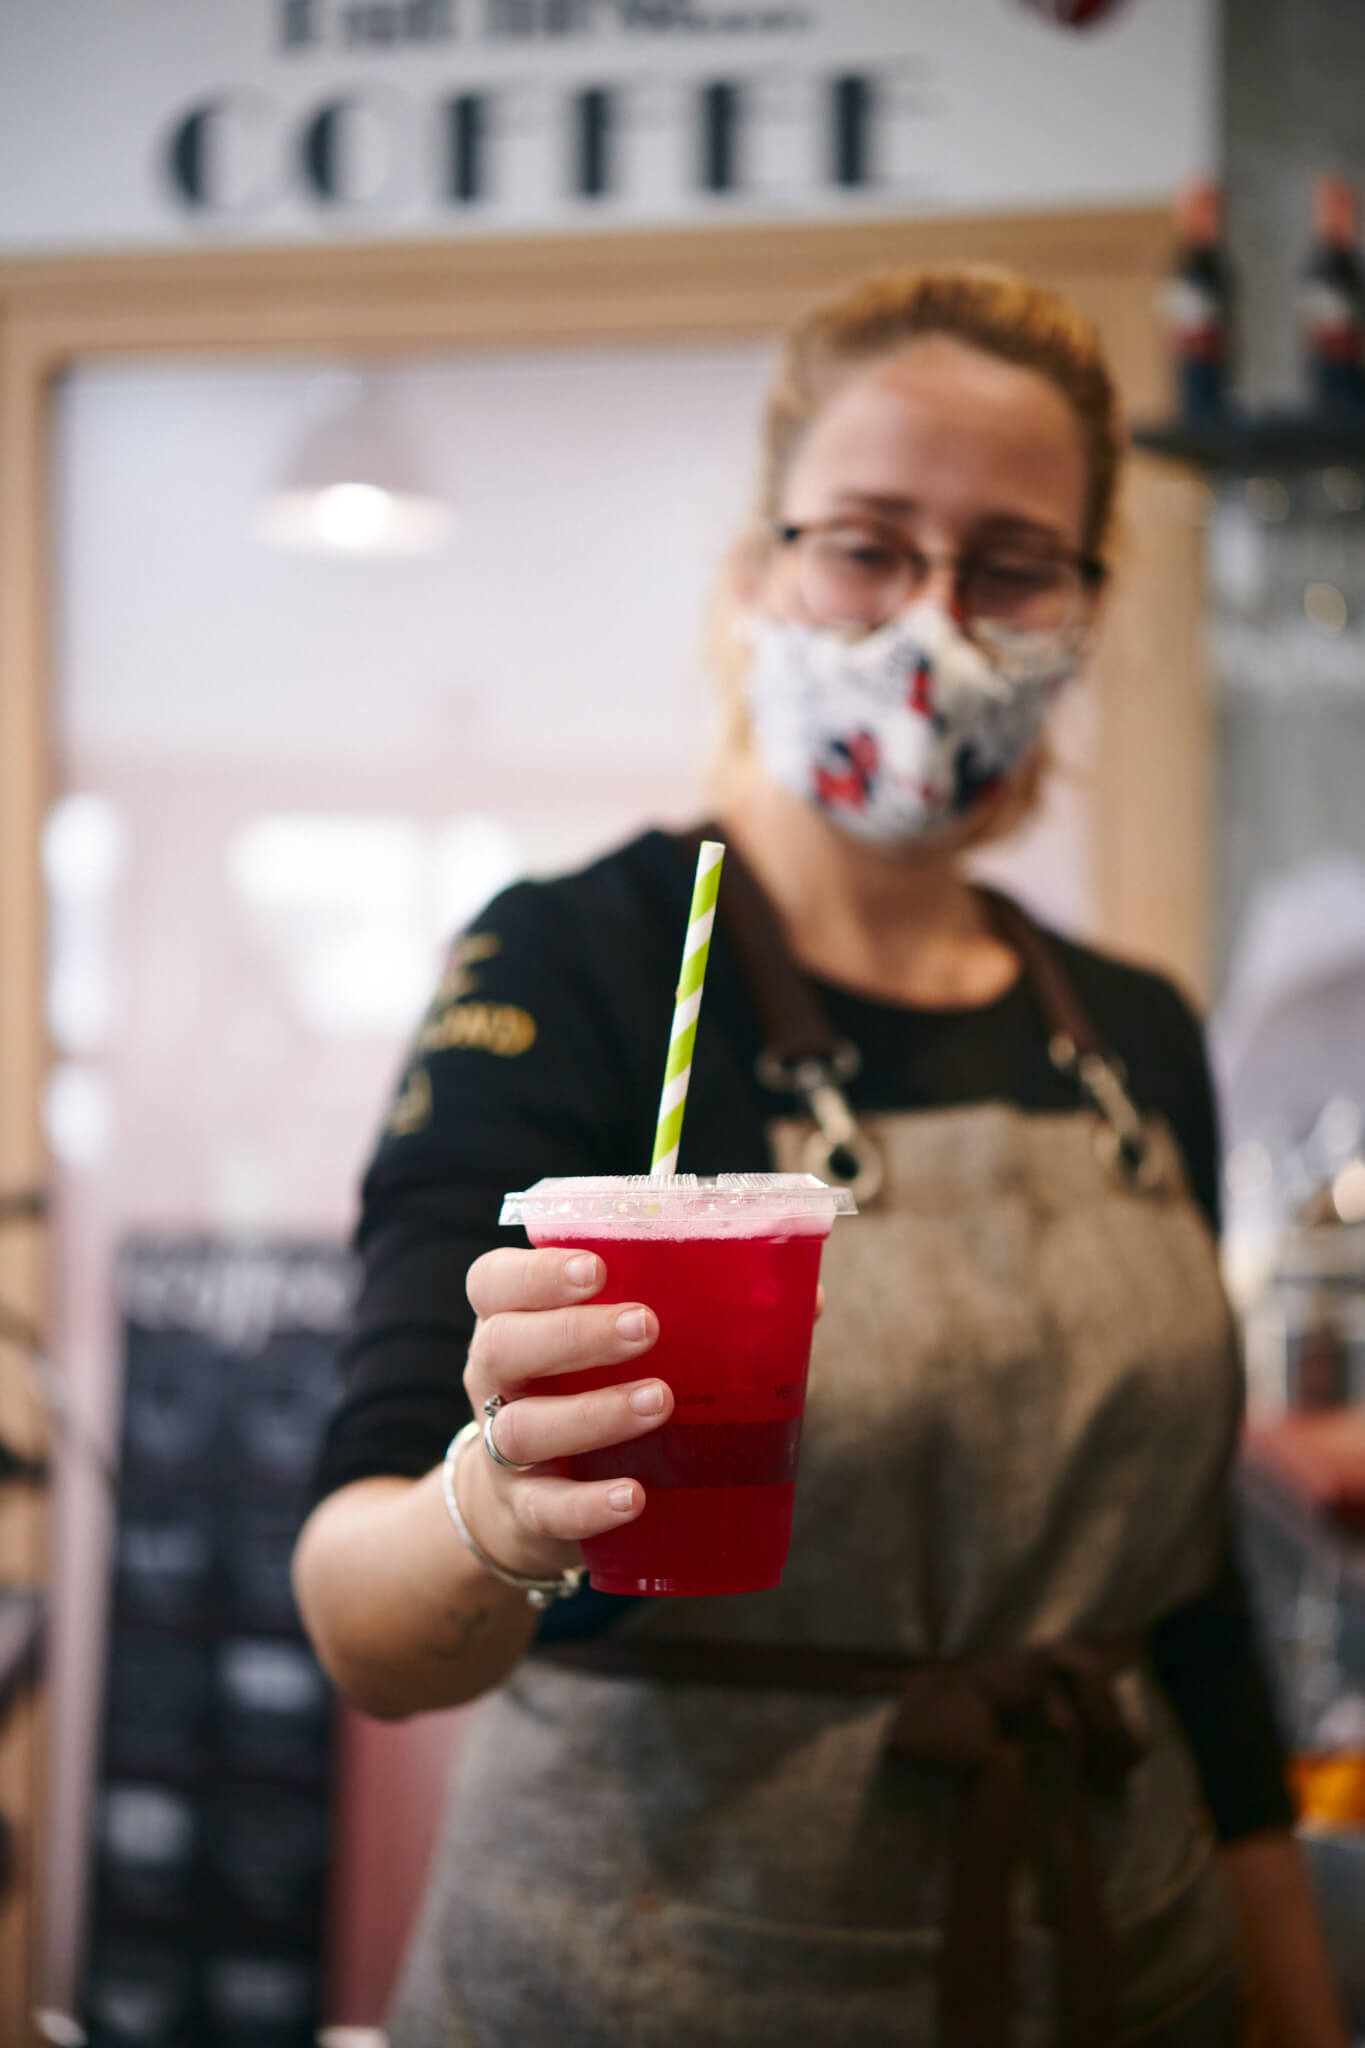 Staff holding a cherry lemonade